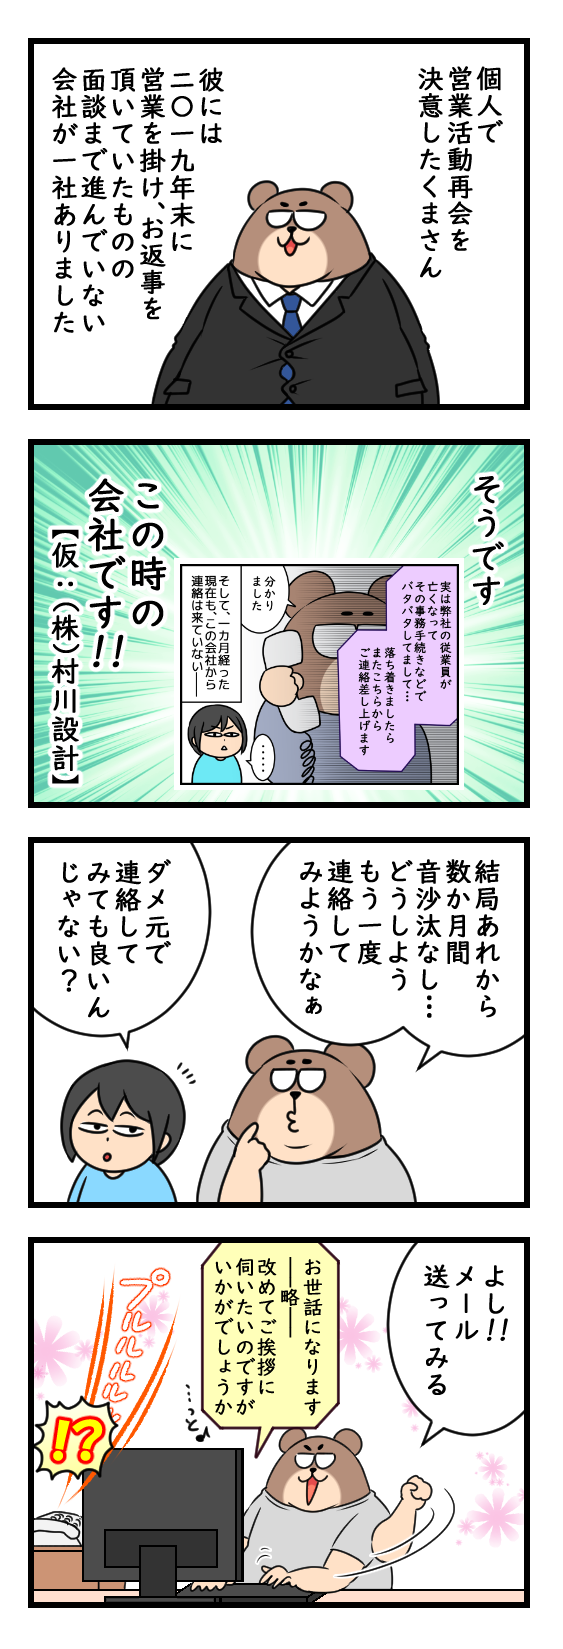 004_1